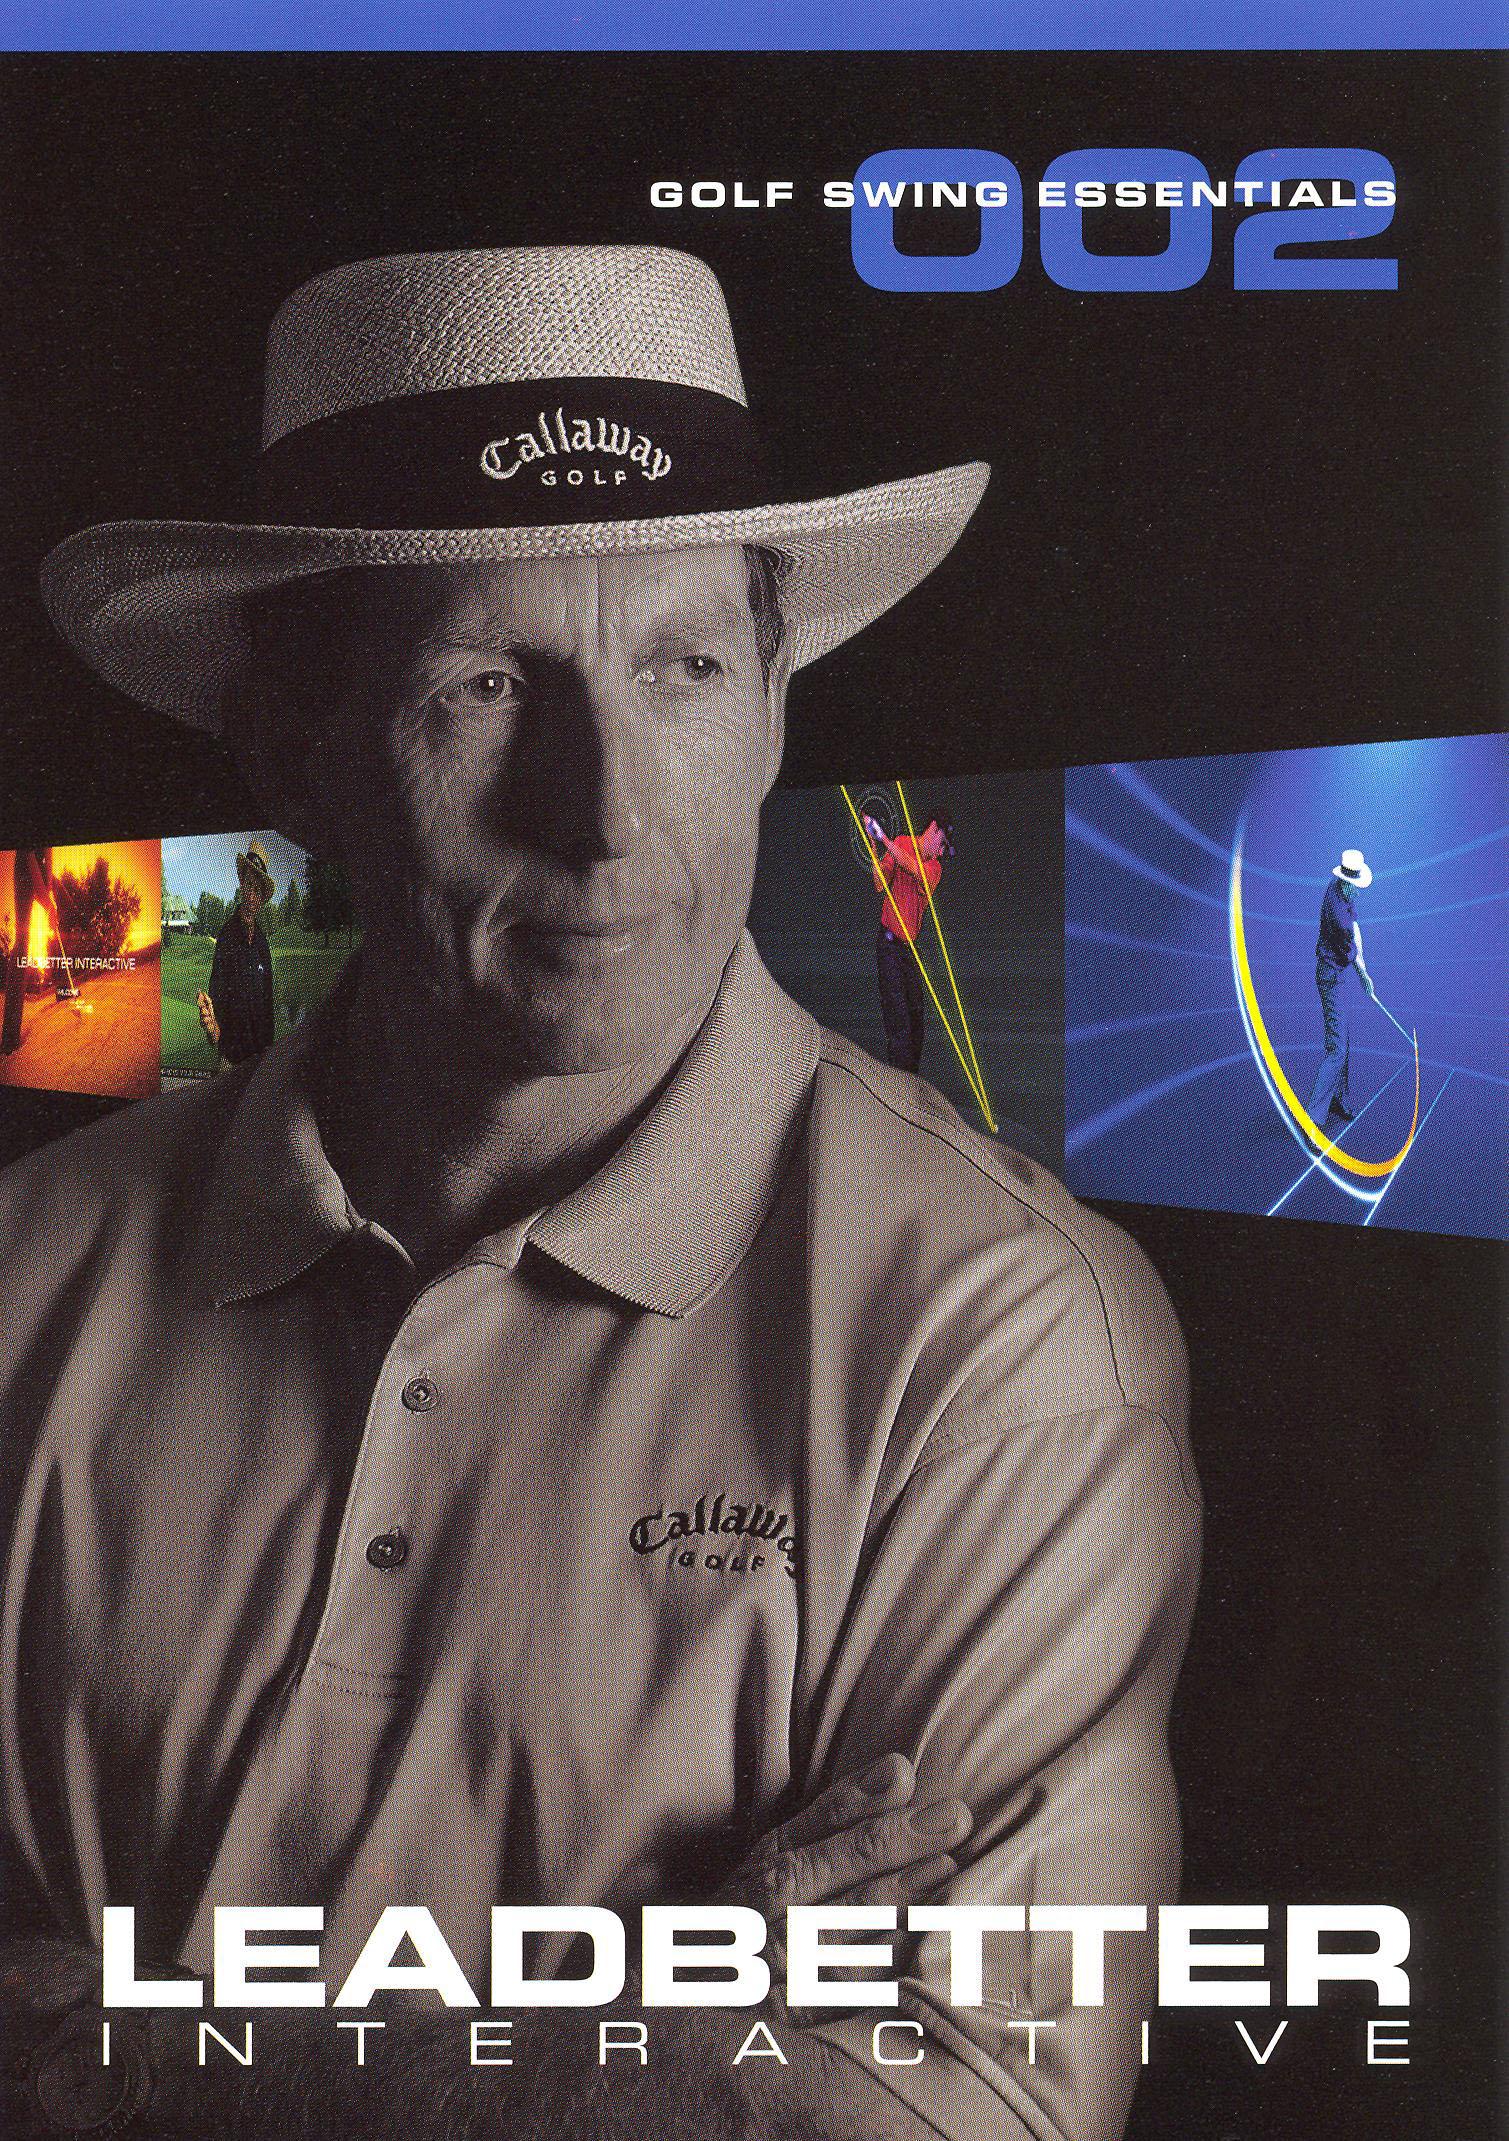 Leadbetter Interactive, Vol. 2: Golf Swing Essentials